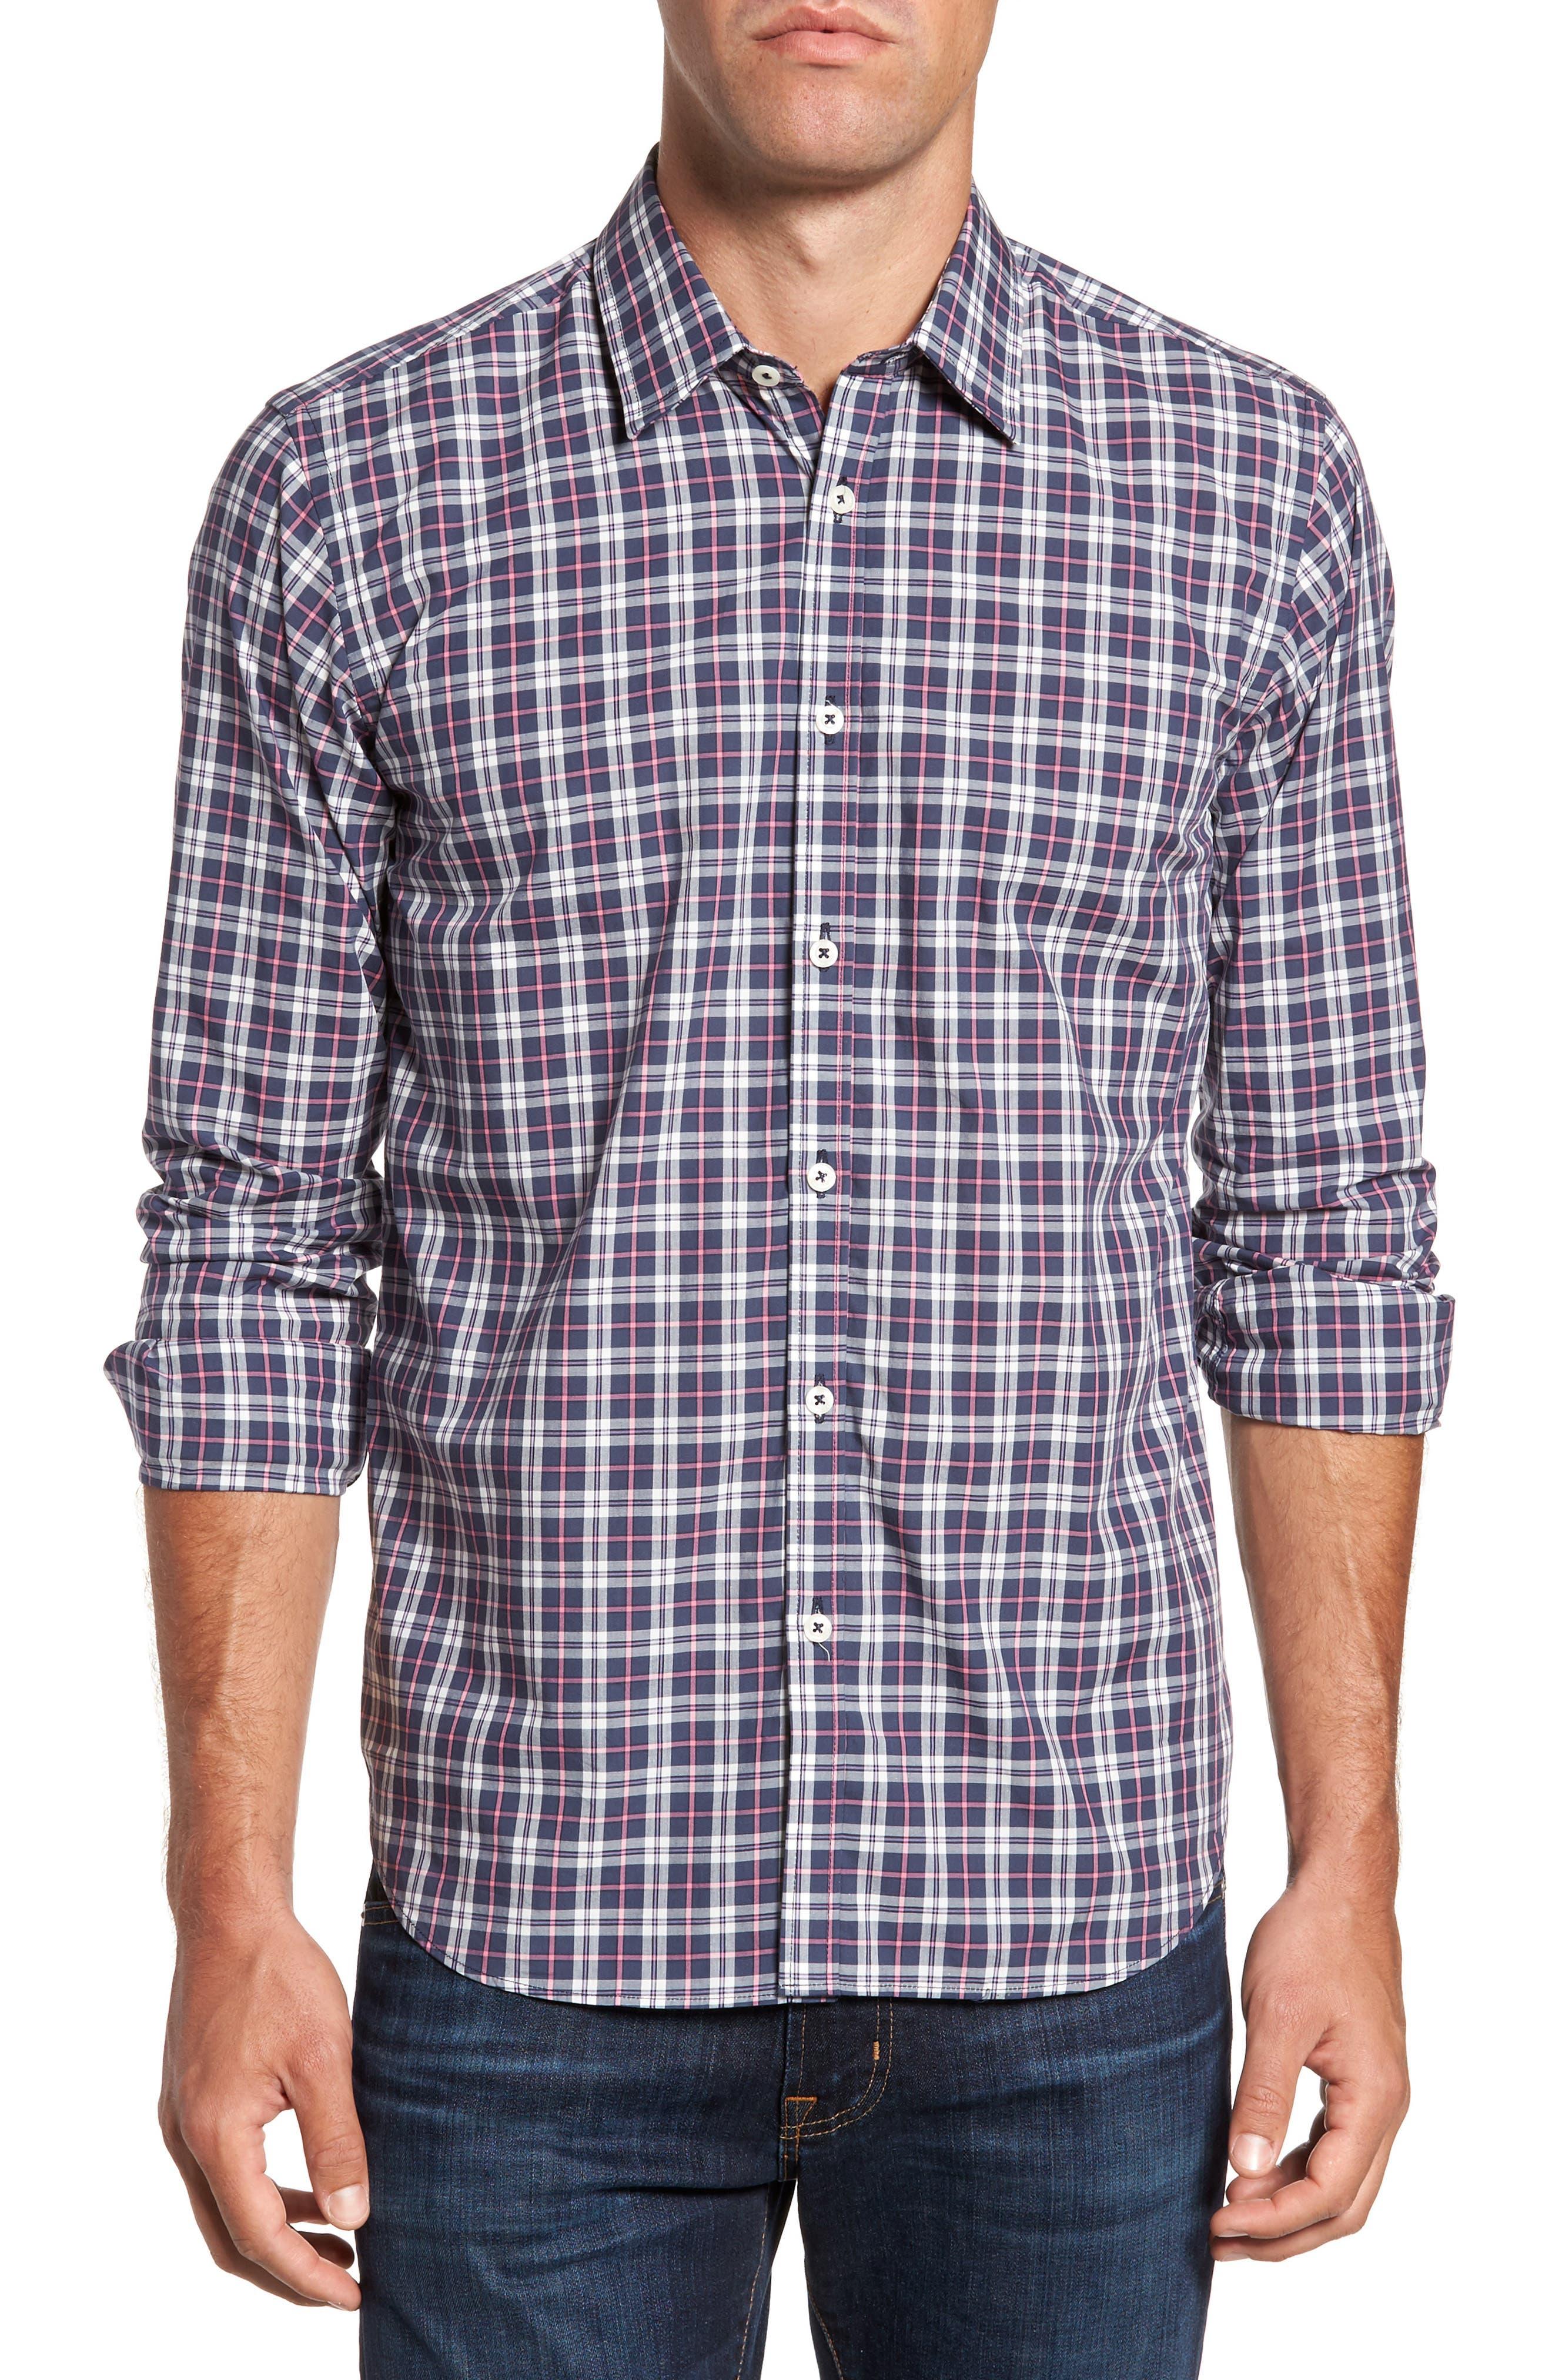 Alternate Image 1 Selected - Jeremy Argyle Slim Fit Plaid Sport Shirt